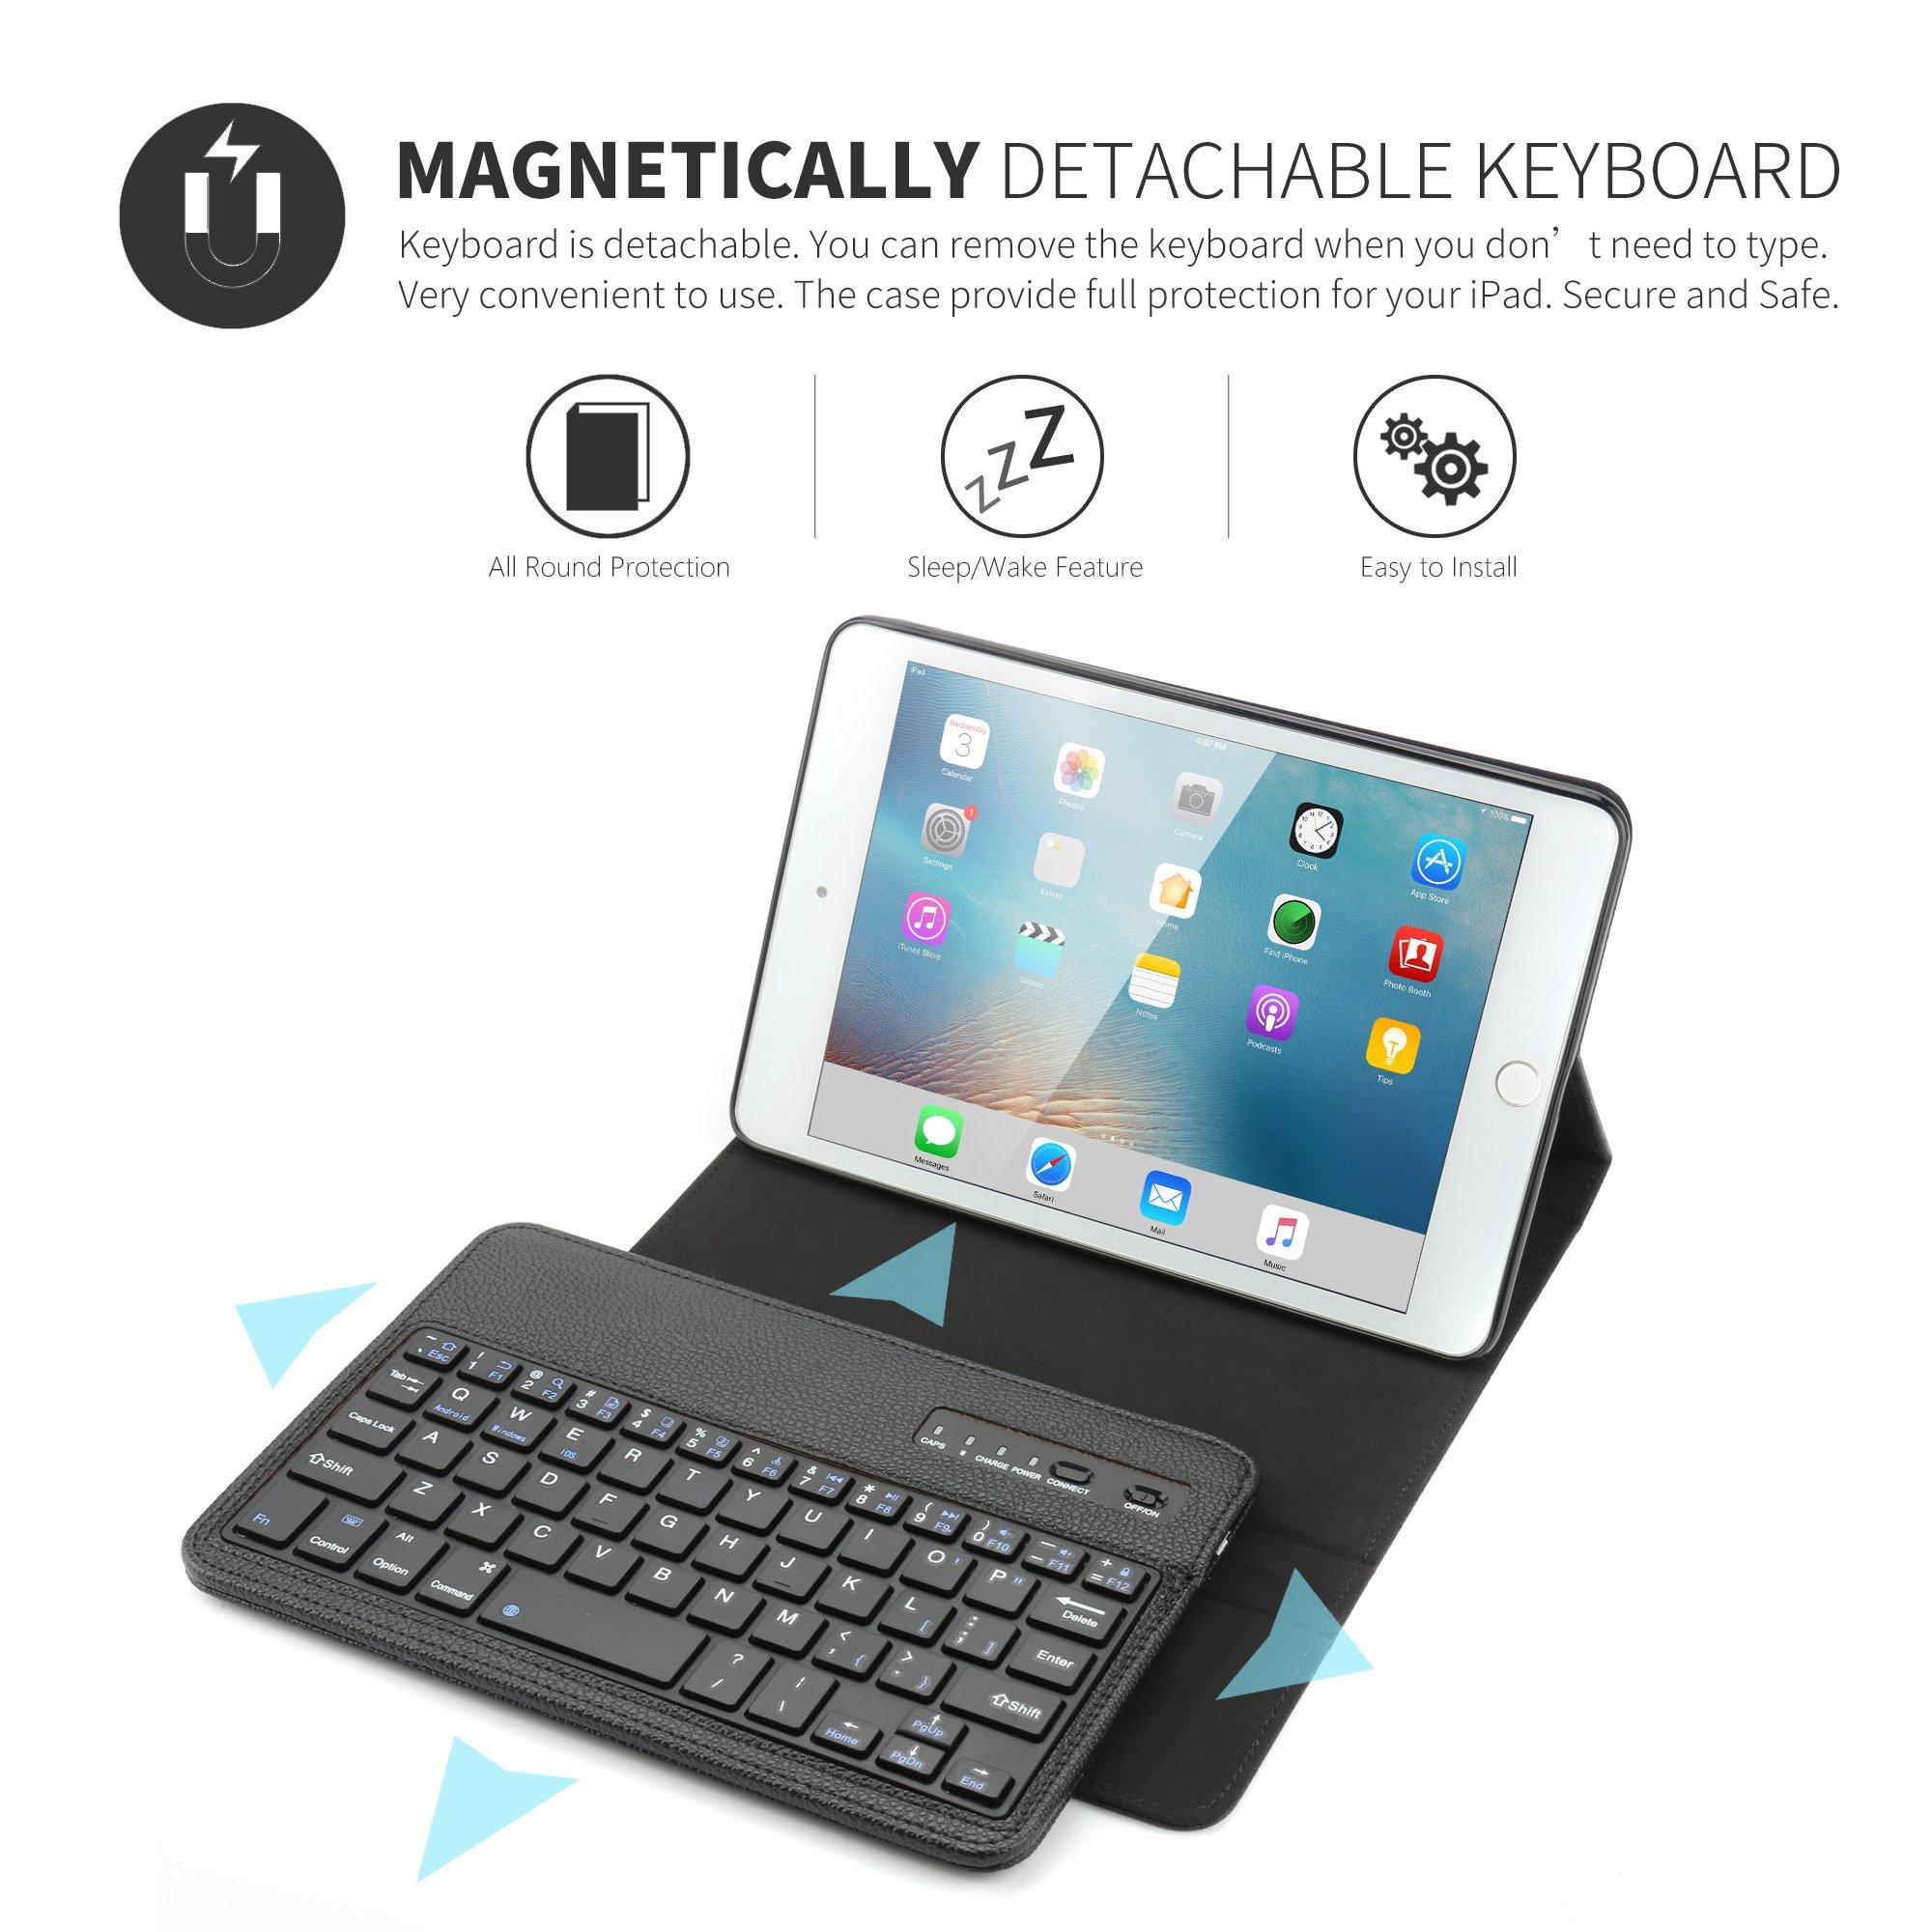 iPad Mini Keyboard Case,Boriyuan iPad Mini Smart Case Stand Folio Leather Cover with Detachable Wireless Bluetooth Keyboard and Screen Protector +Stylus for Apple iPad Mini 1/Mini 2/Mini 3 (Black) by Boriyuan (Image #3)